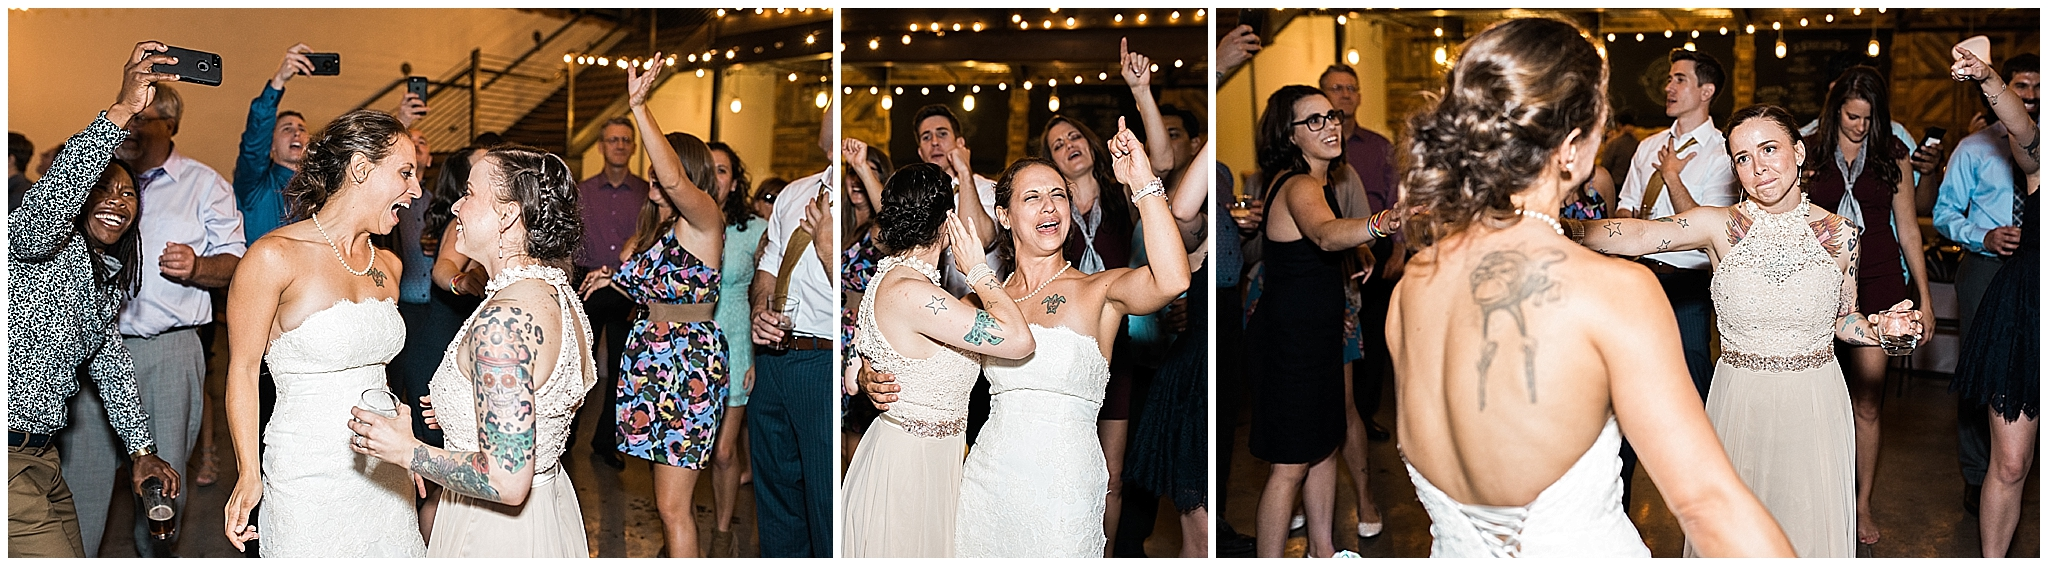 Wedding_Asheville_Highland_Brewing_Photographer_37.jpg